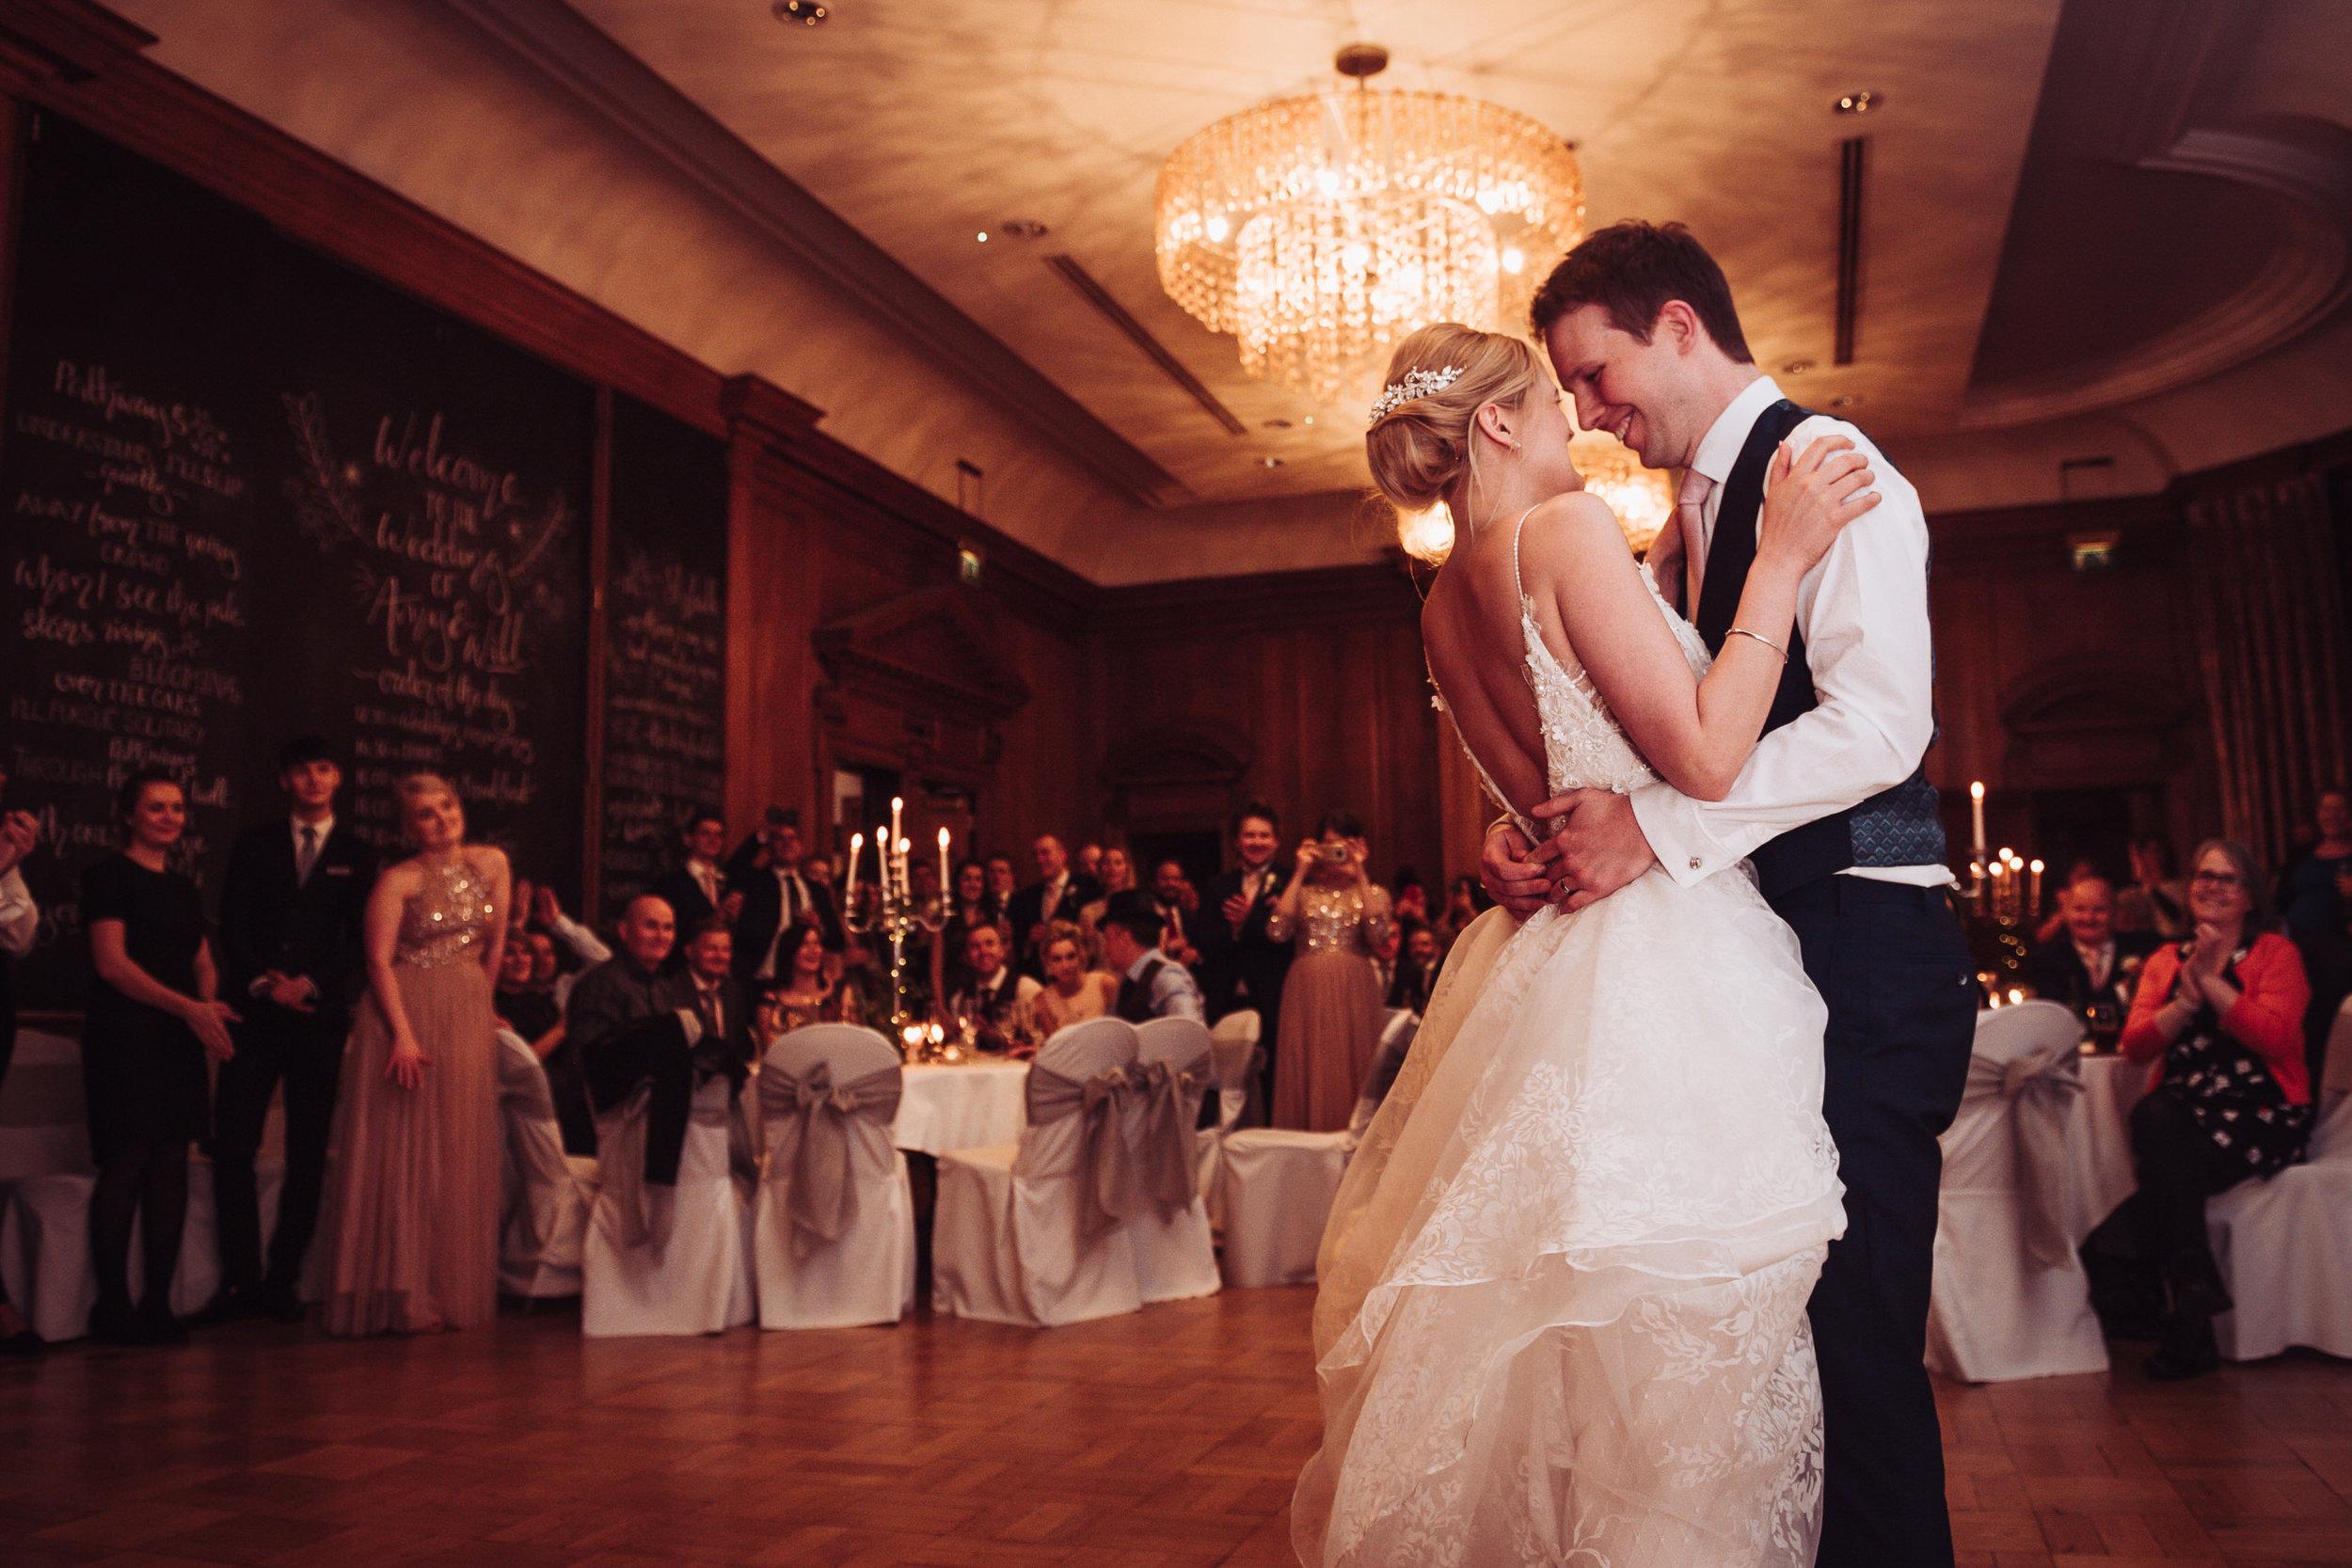 the-grand-hotel-york-wedding-photographer-50.jpg